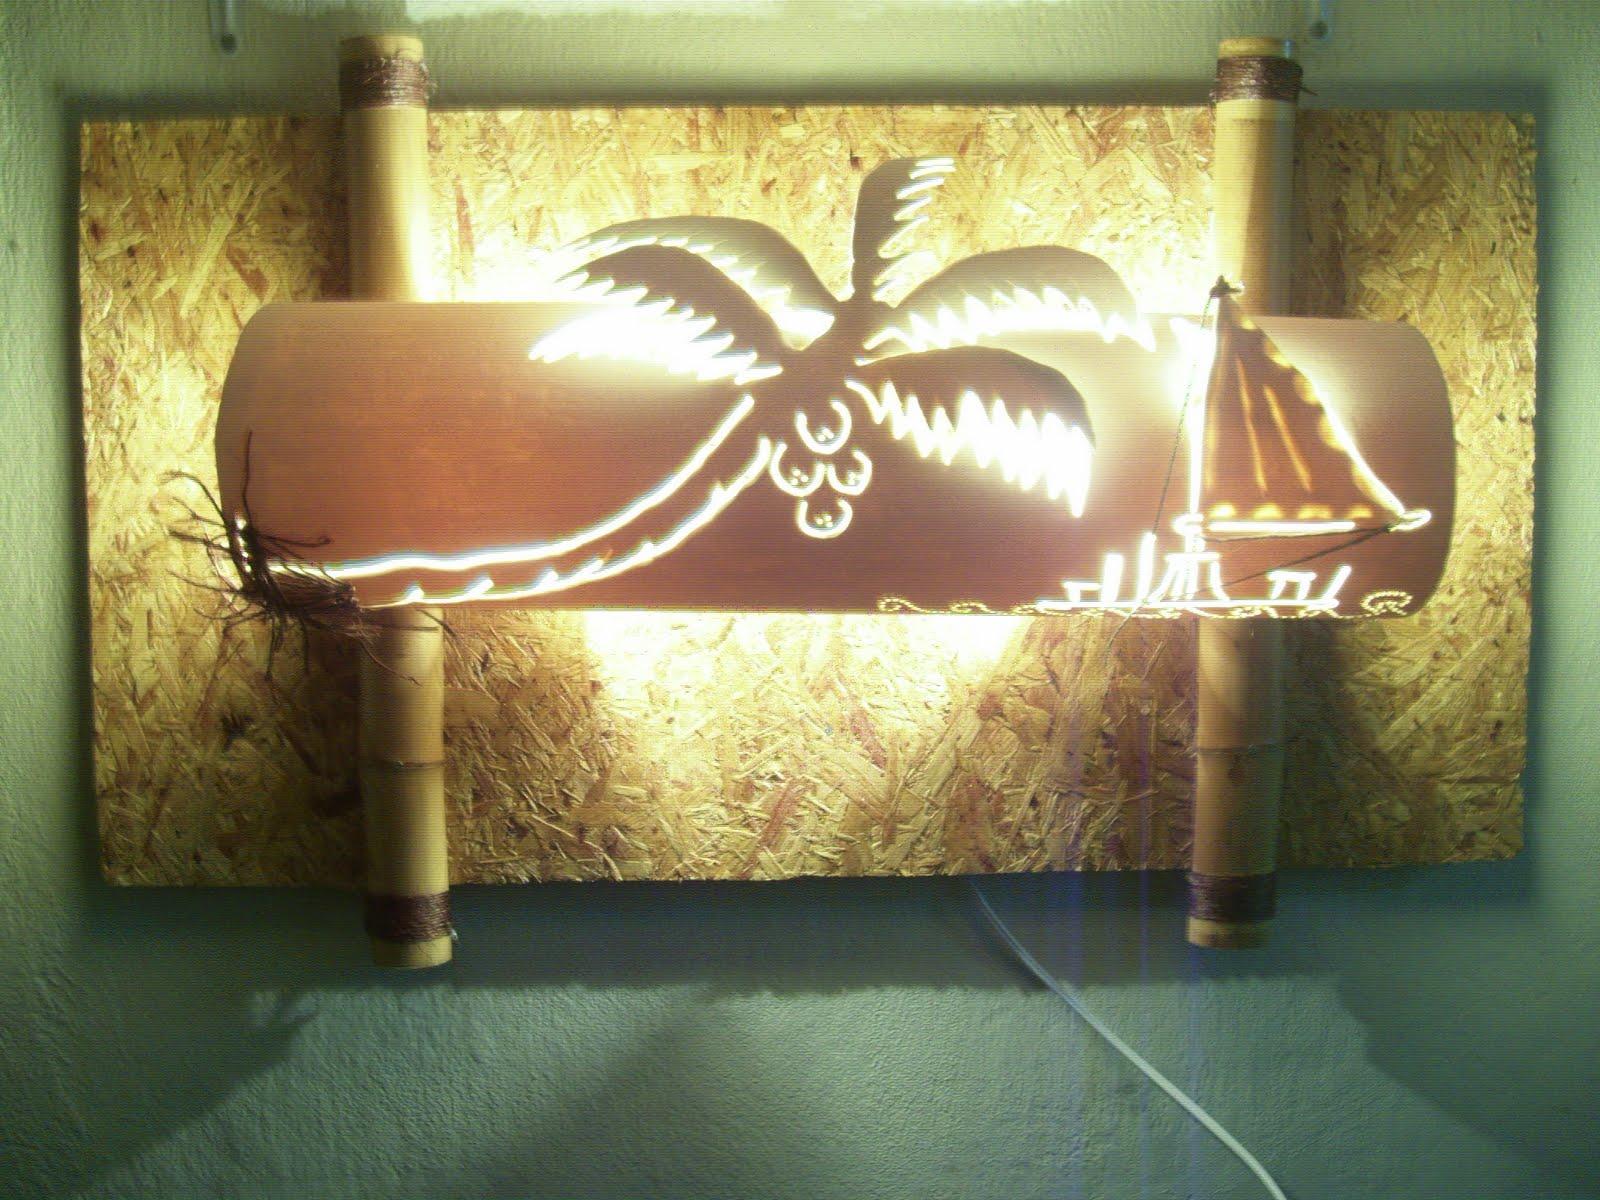 Oficina Luminart: Arandela Vida Mansa em PVC 100cm X 40cm #93A02B 1600x1200